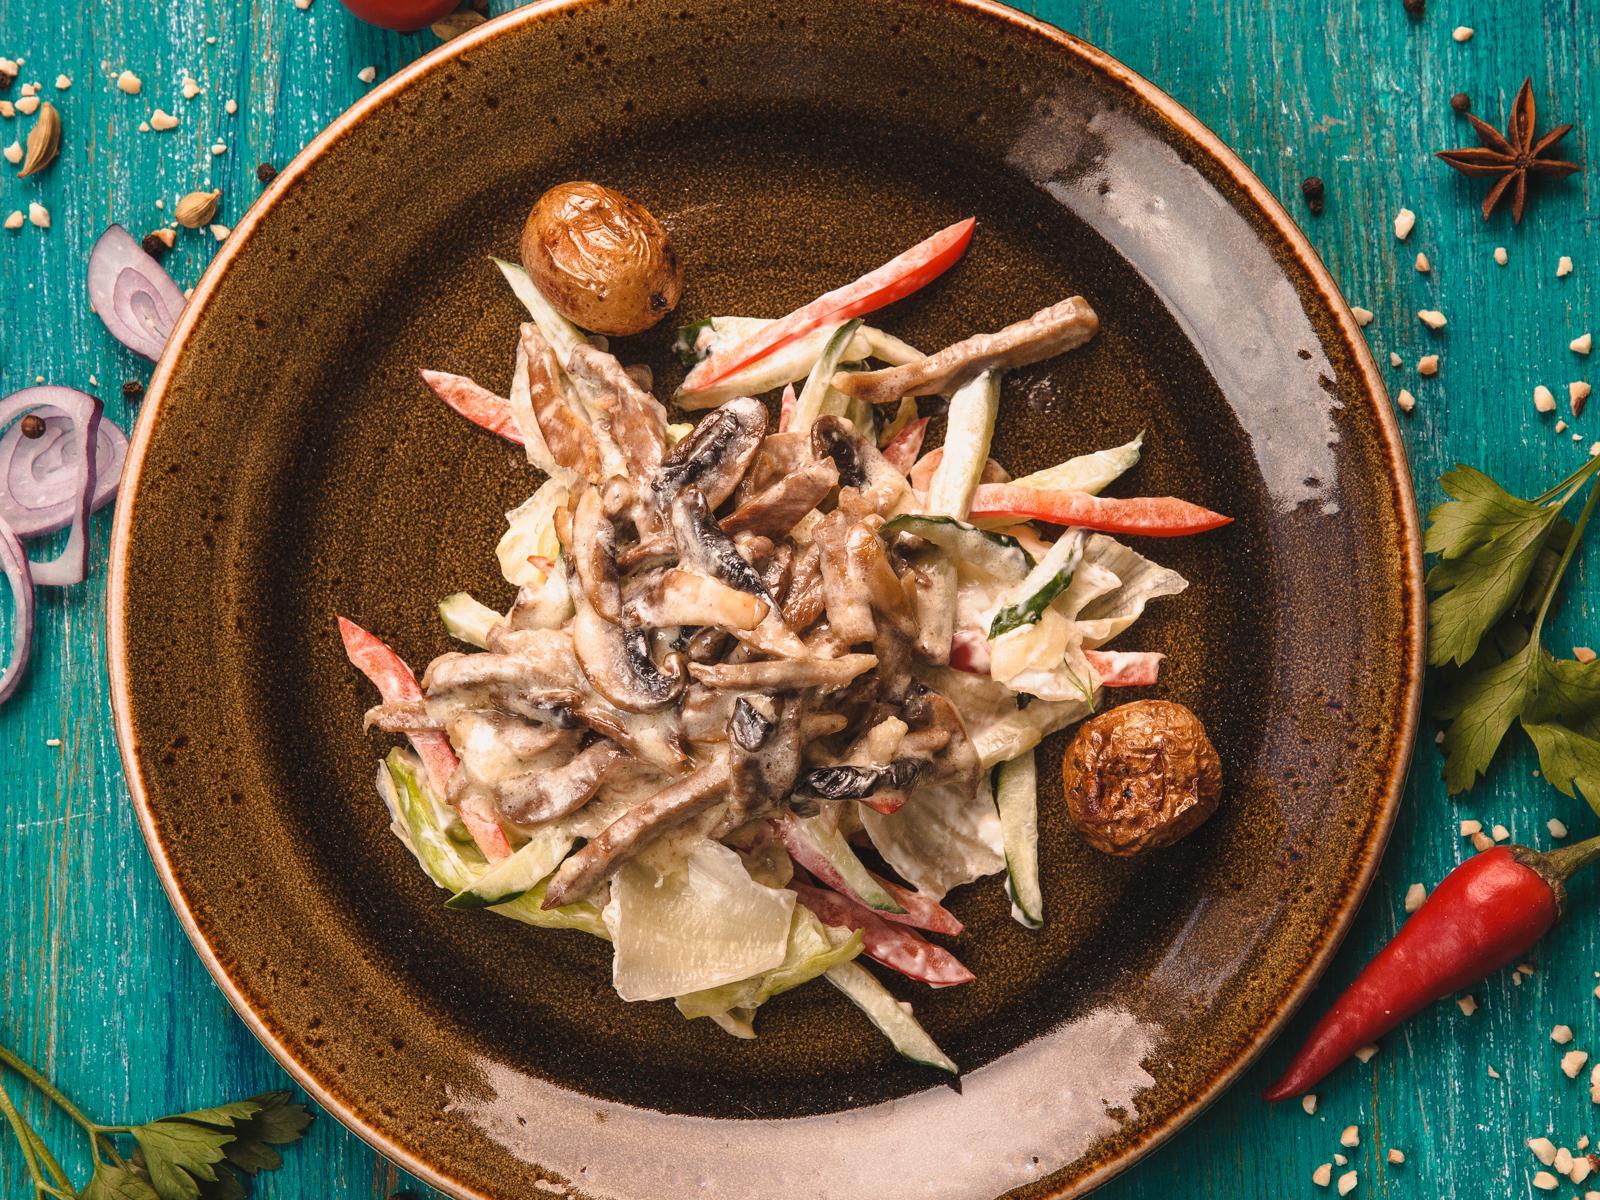 Салат с языком и беби картофелем